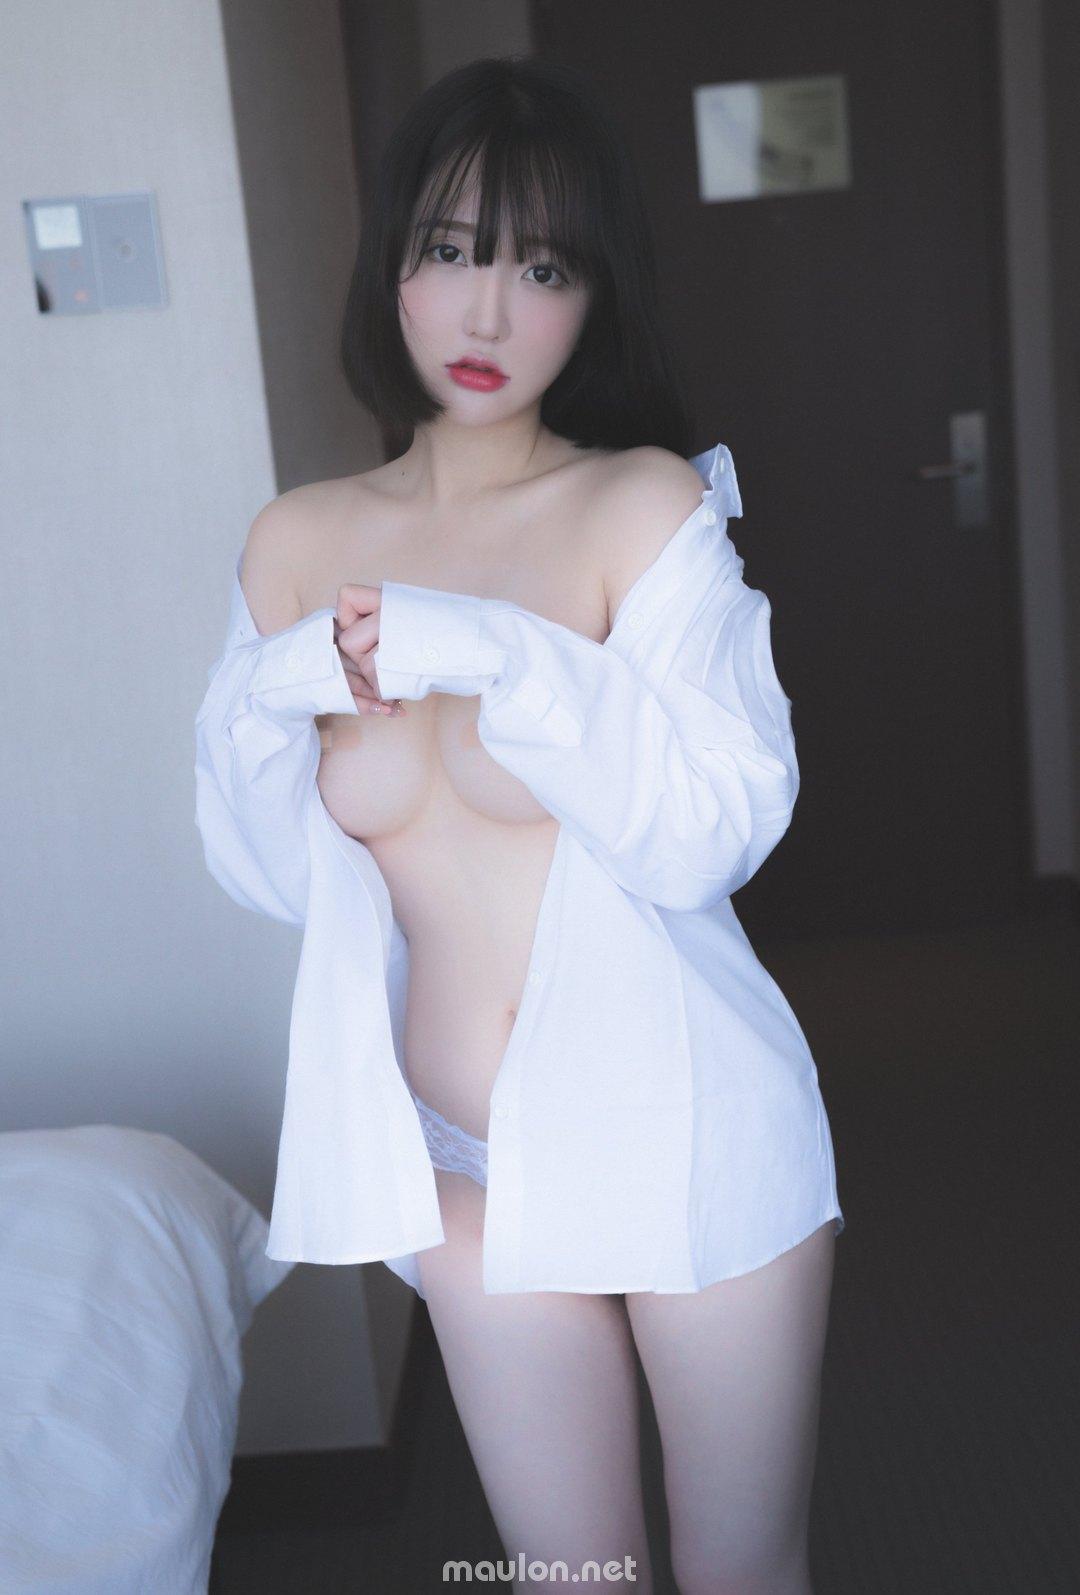 MauLon.Net - Ảnh sex pure media - vi rút triệt nòi phải đút cái vòi vào em